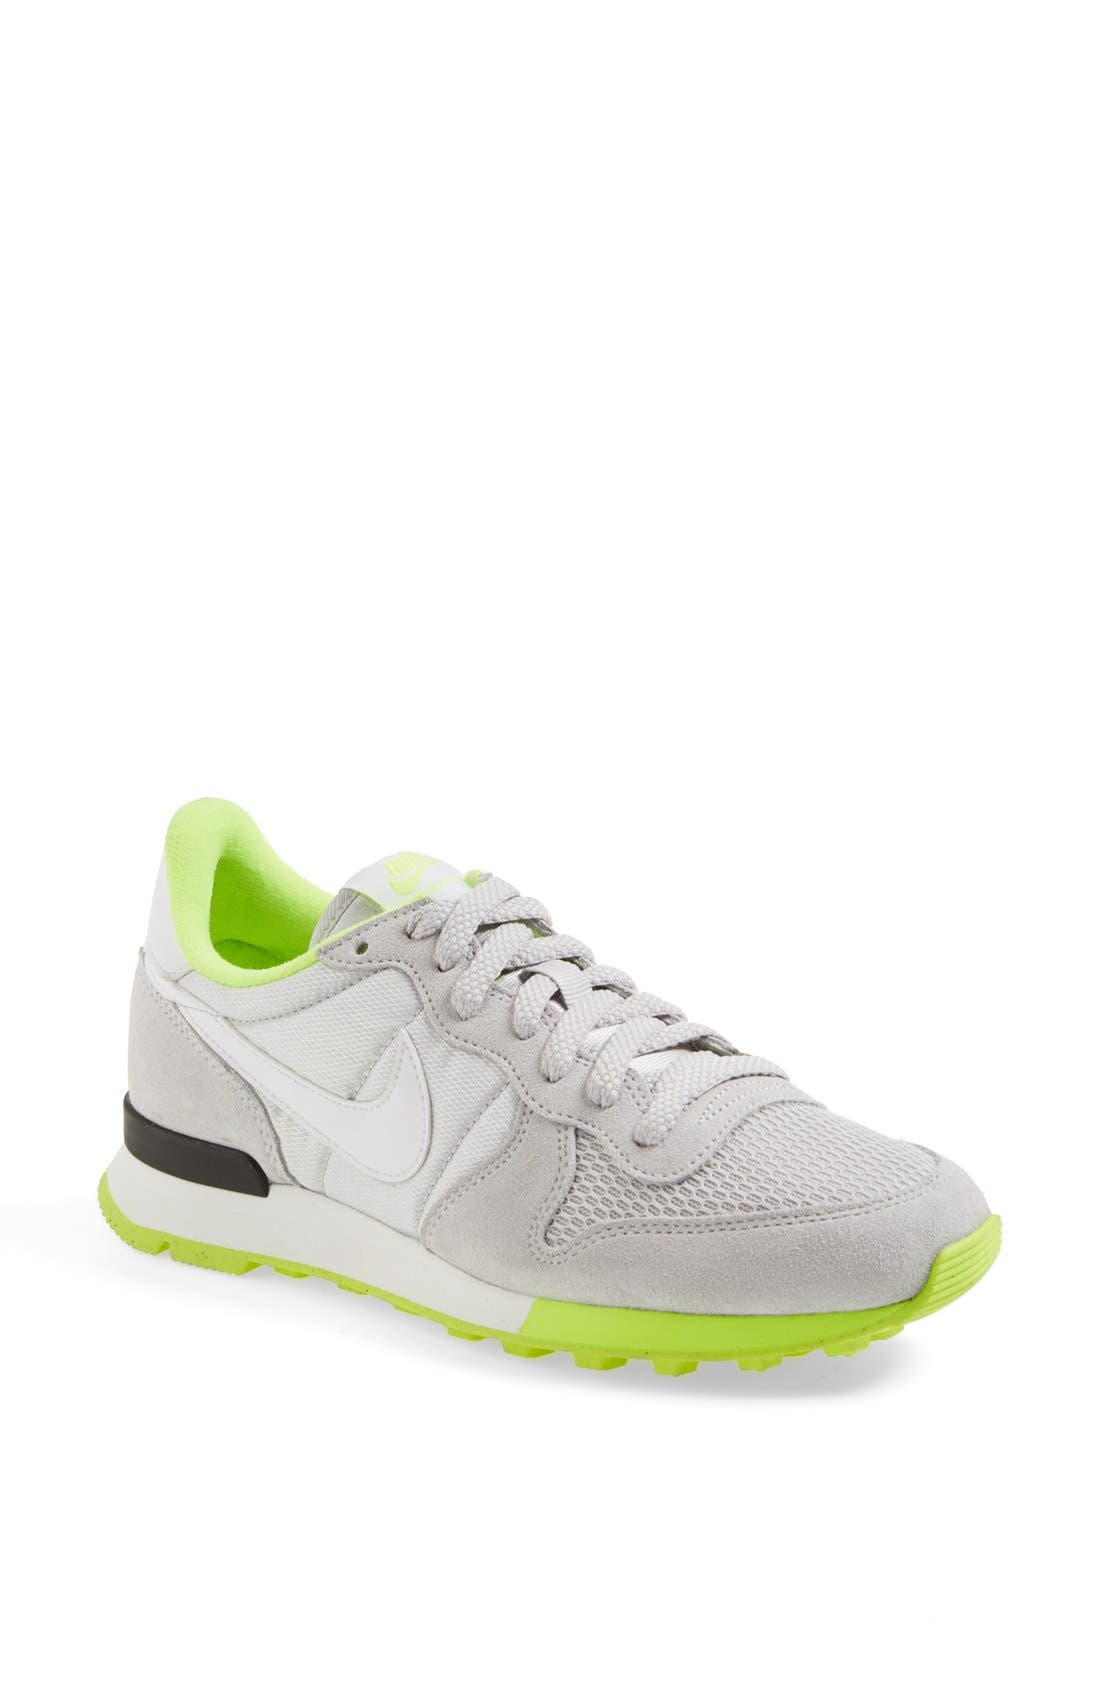 Alternate Image 1 Selected - Nike 'Internationalist' Sneaker (Women)